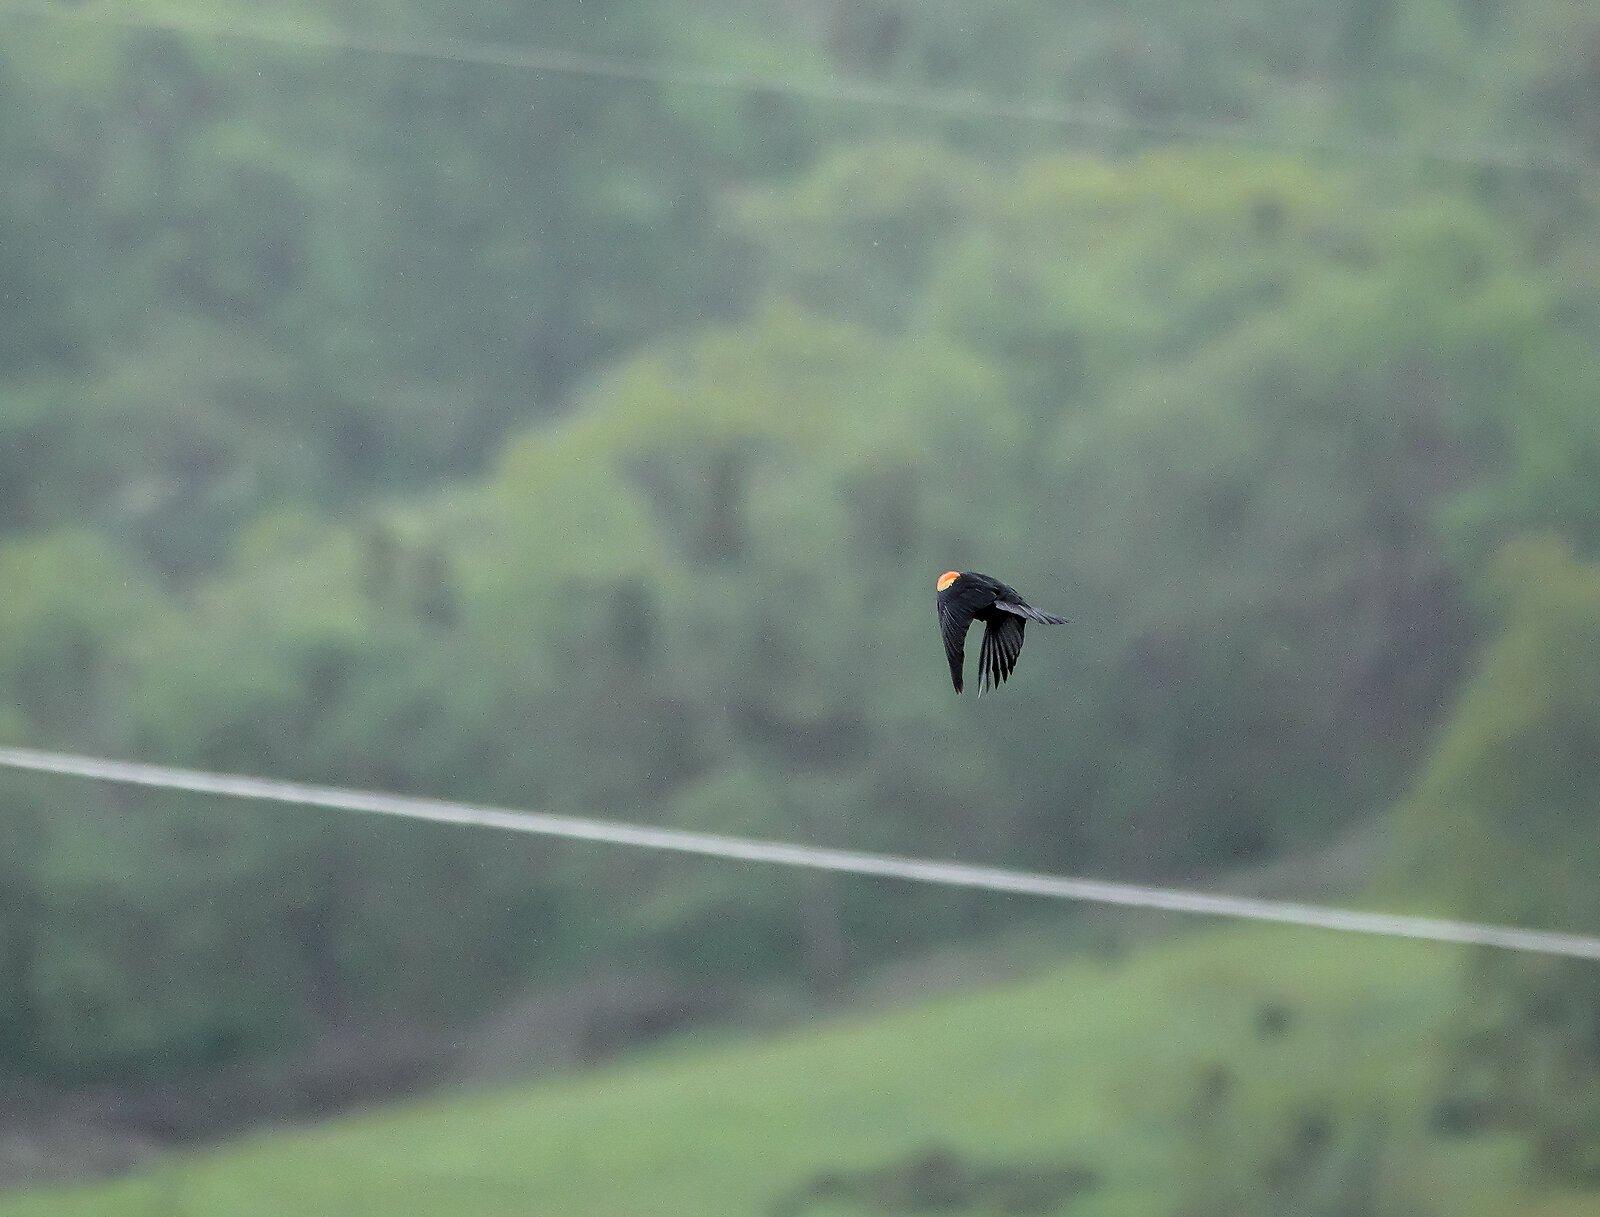 RX10_Apr24_21_blackbird_flying#2.jpg